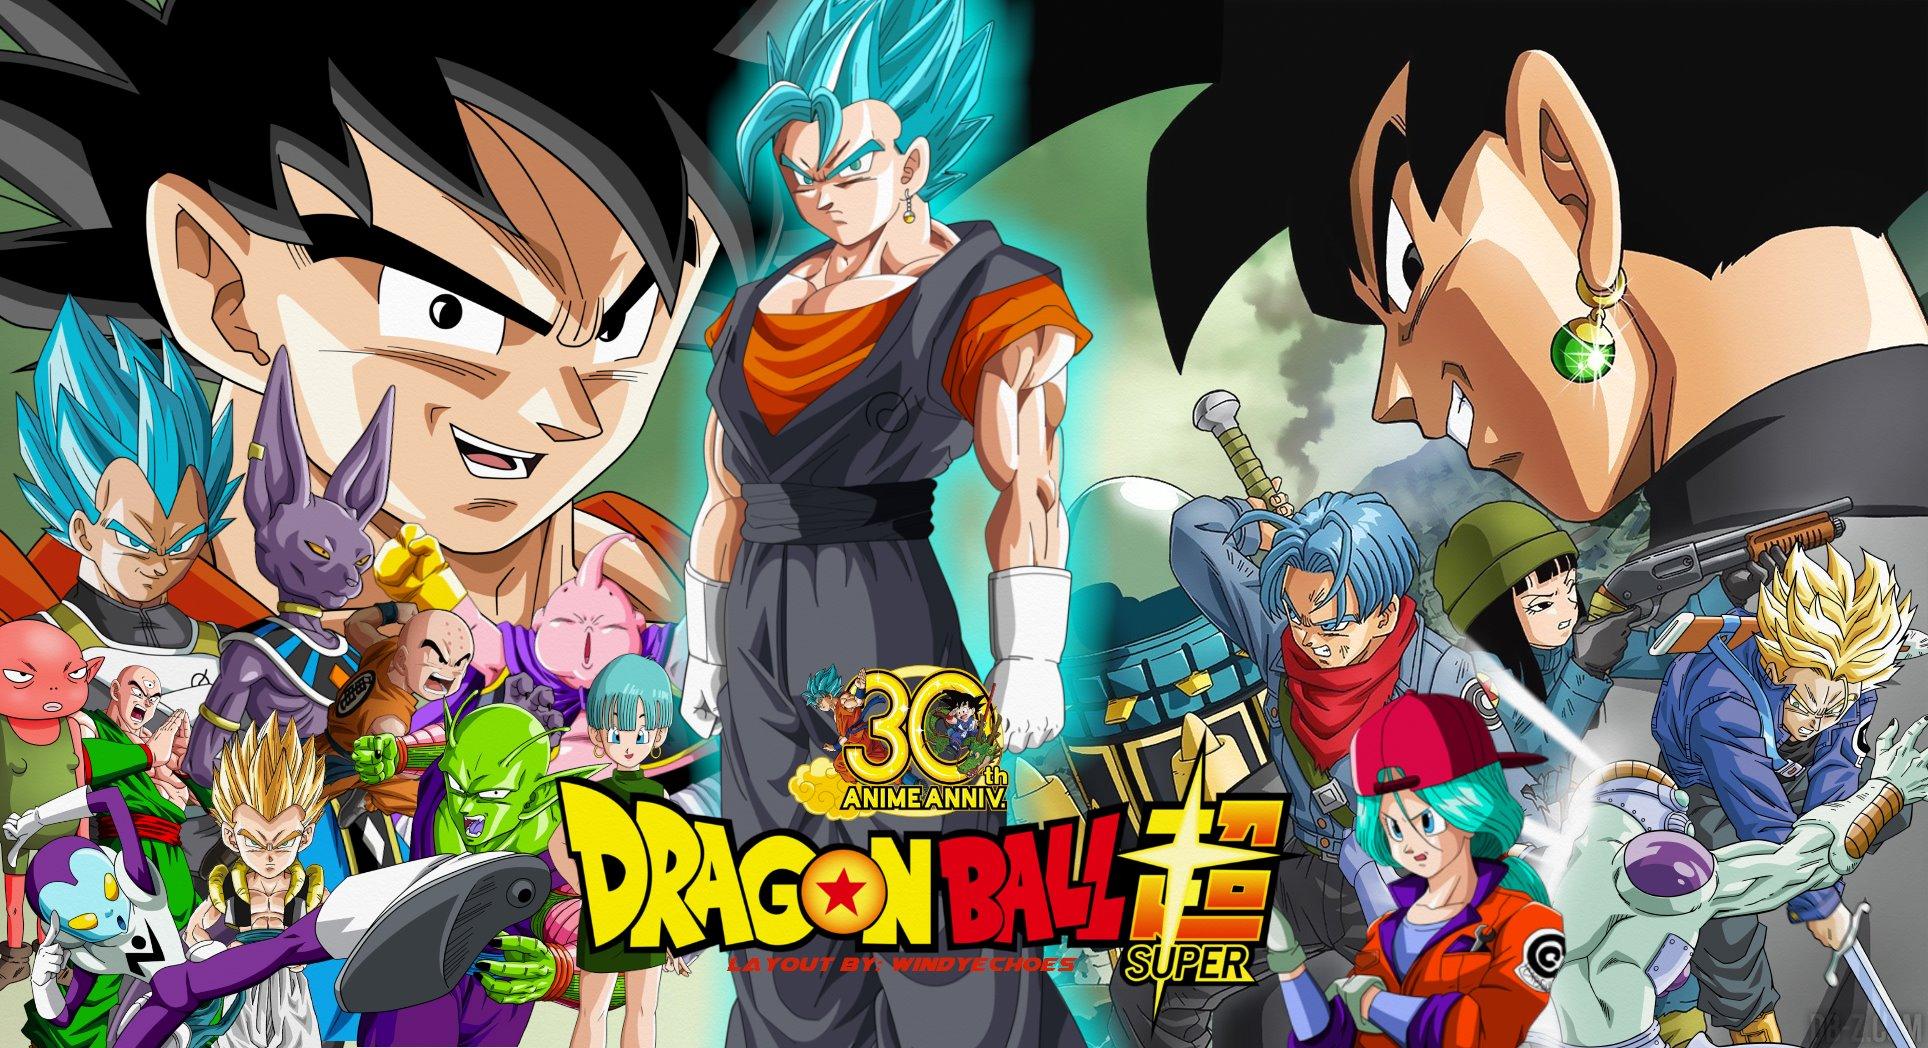 Dragon Ball Super Wallpaper Black Goku And Trunks By WindyEchoes On DeviantArt